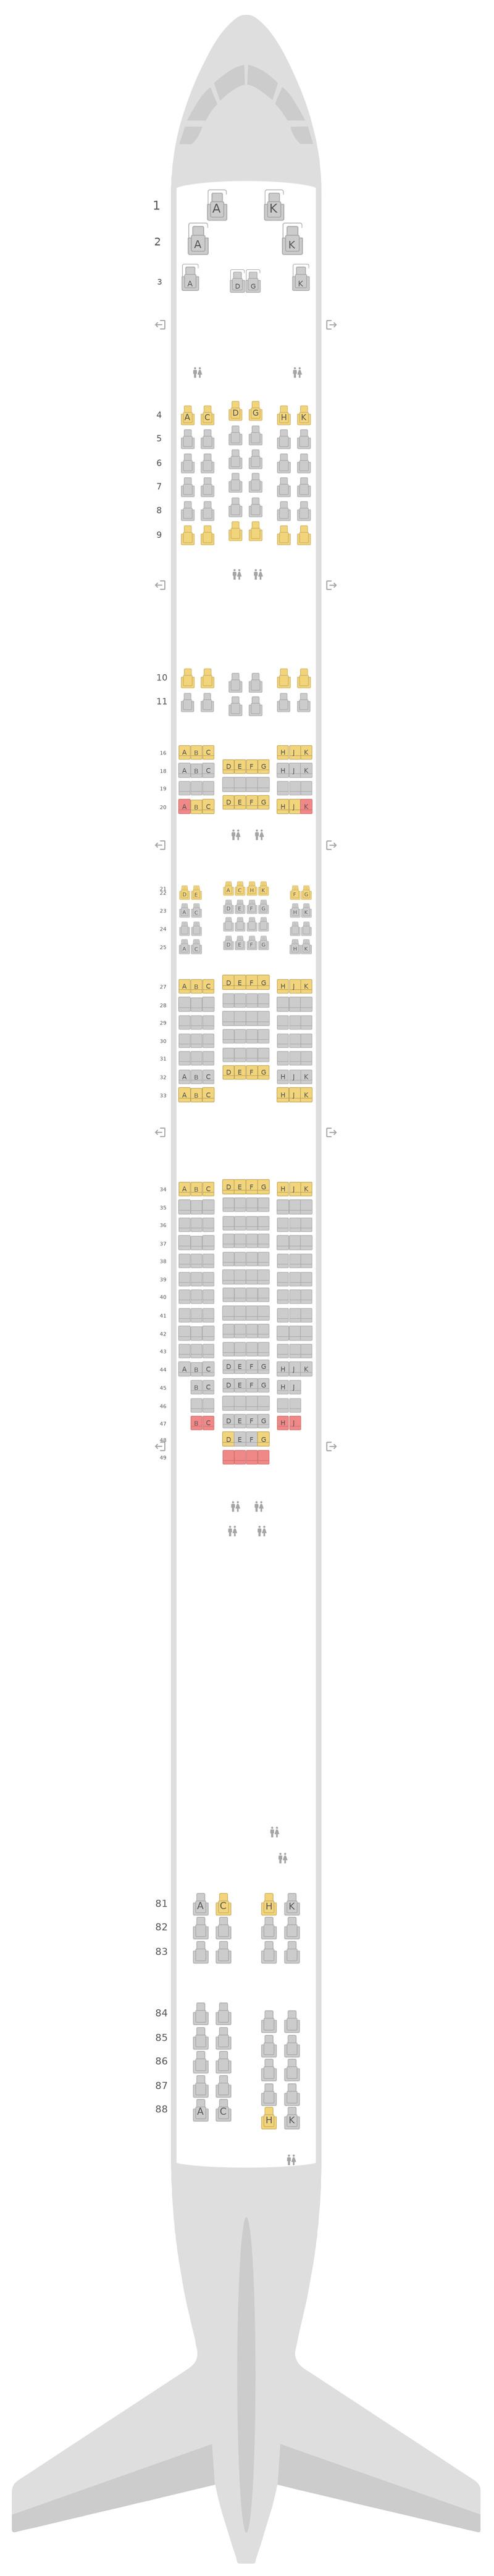 Sitzplan Boeing 747-8 Lufthansa